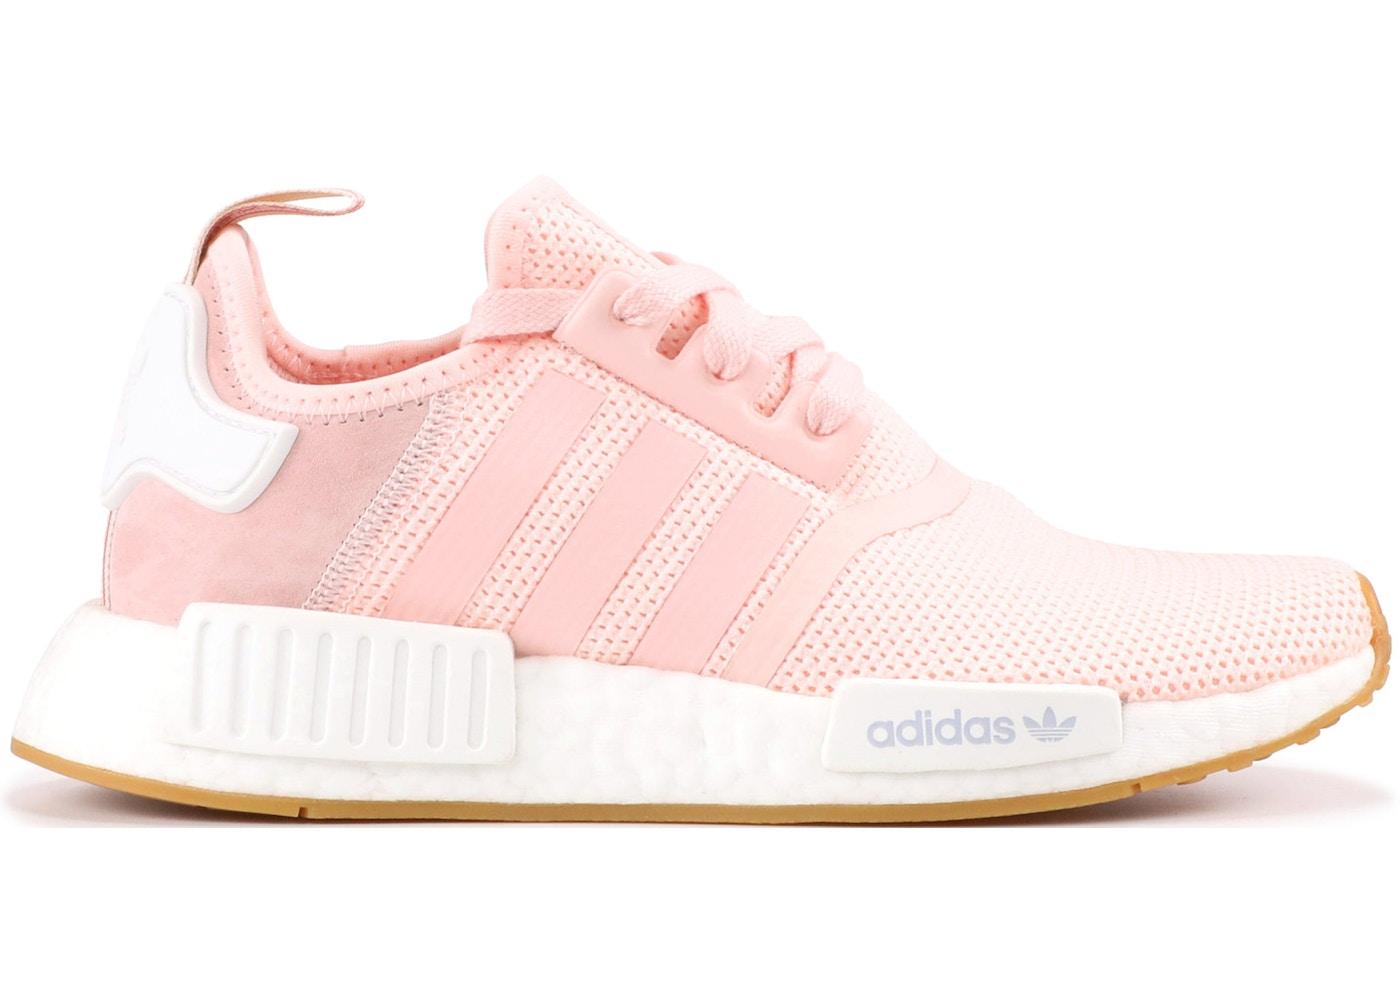 huge discount 409c6 c3f5c adidas NMD R1 Pink Gum (W)